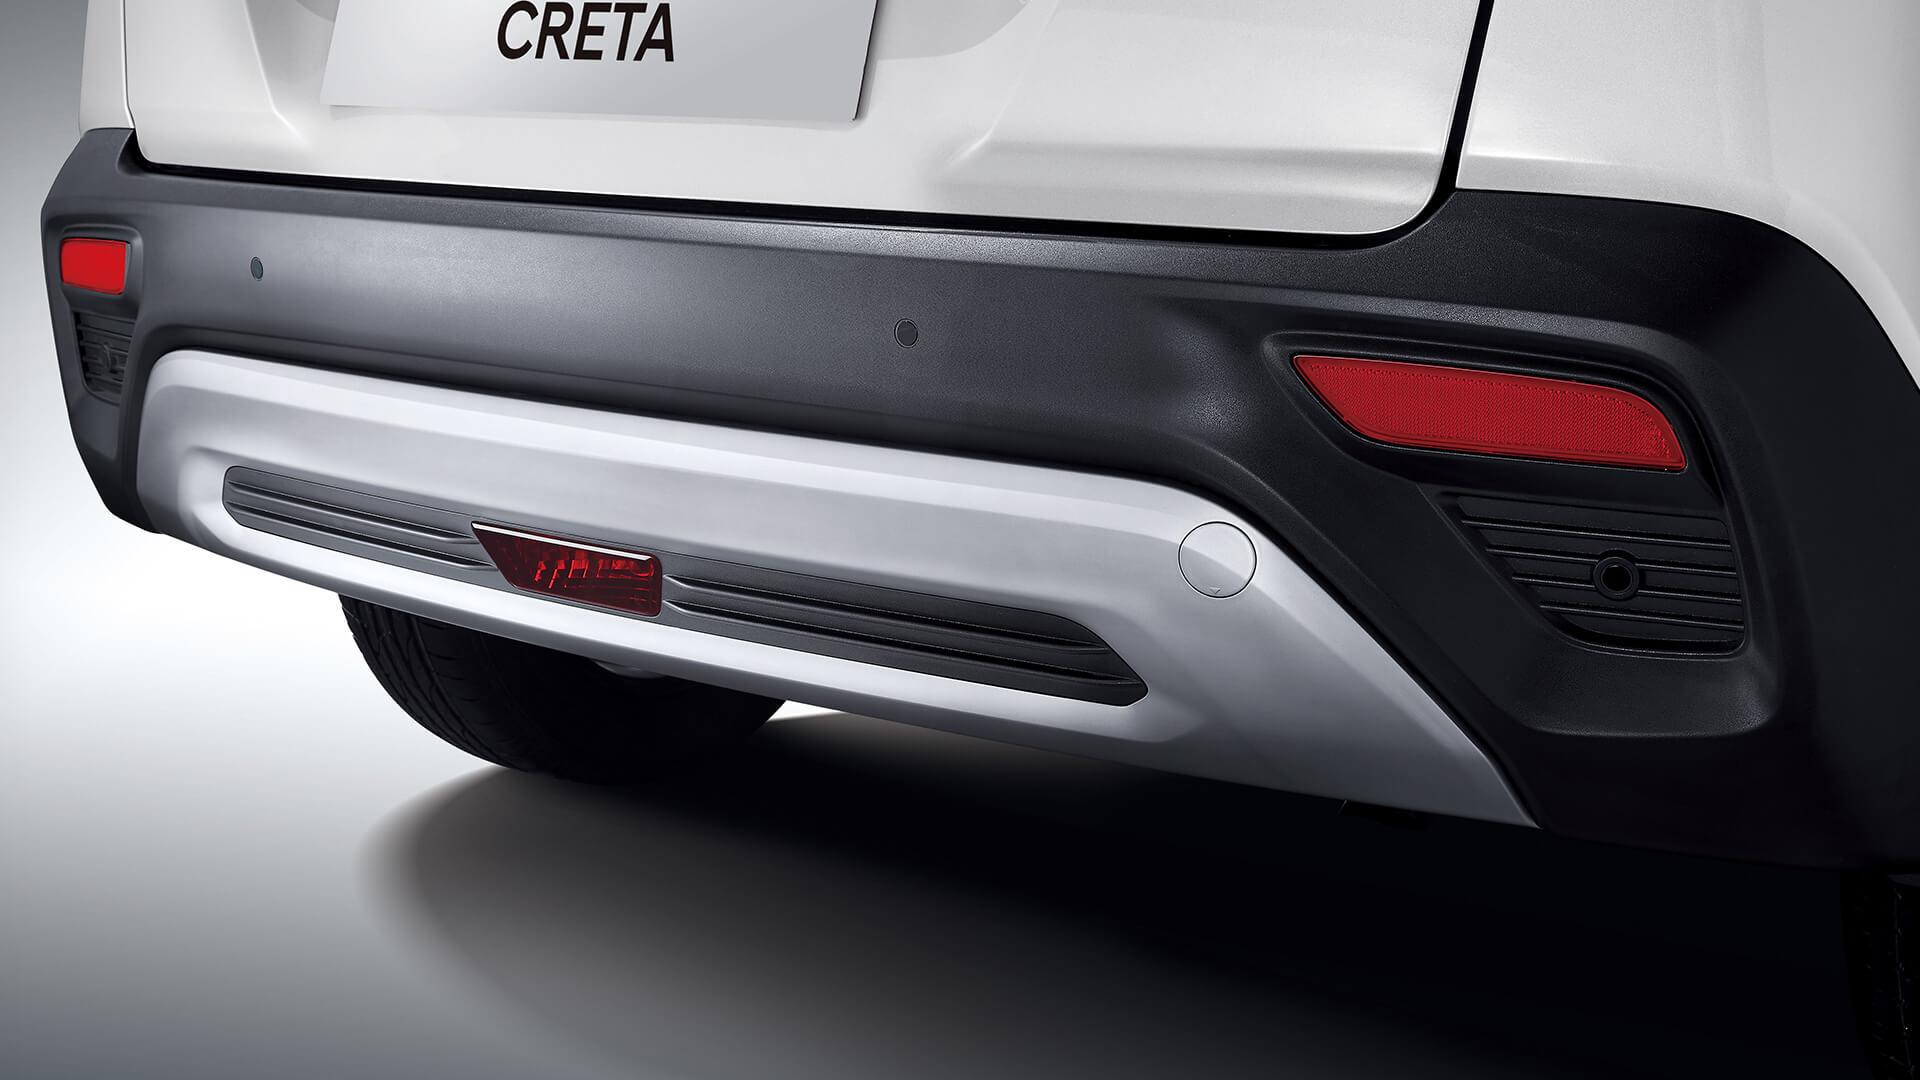 creta-2020-ext-05